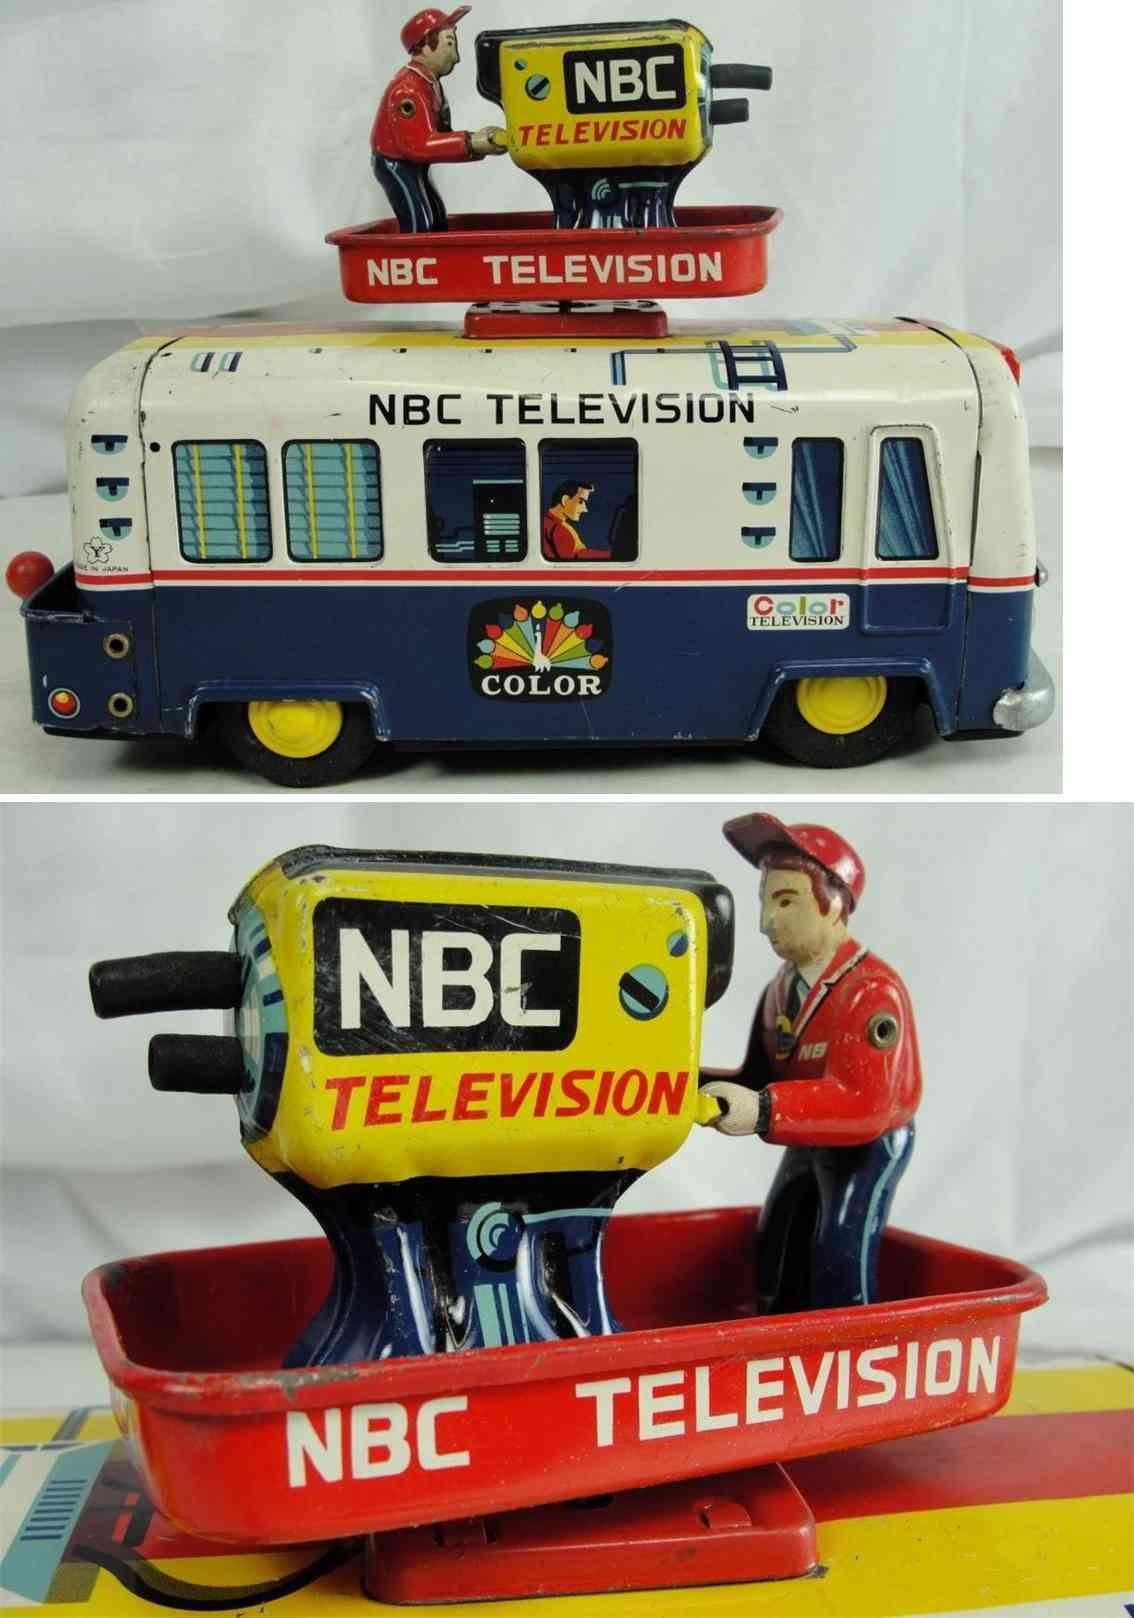 Toys car and truck  Cragstan TinBuses NBC television camera truck van made of tin